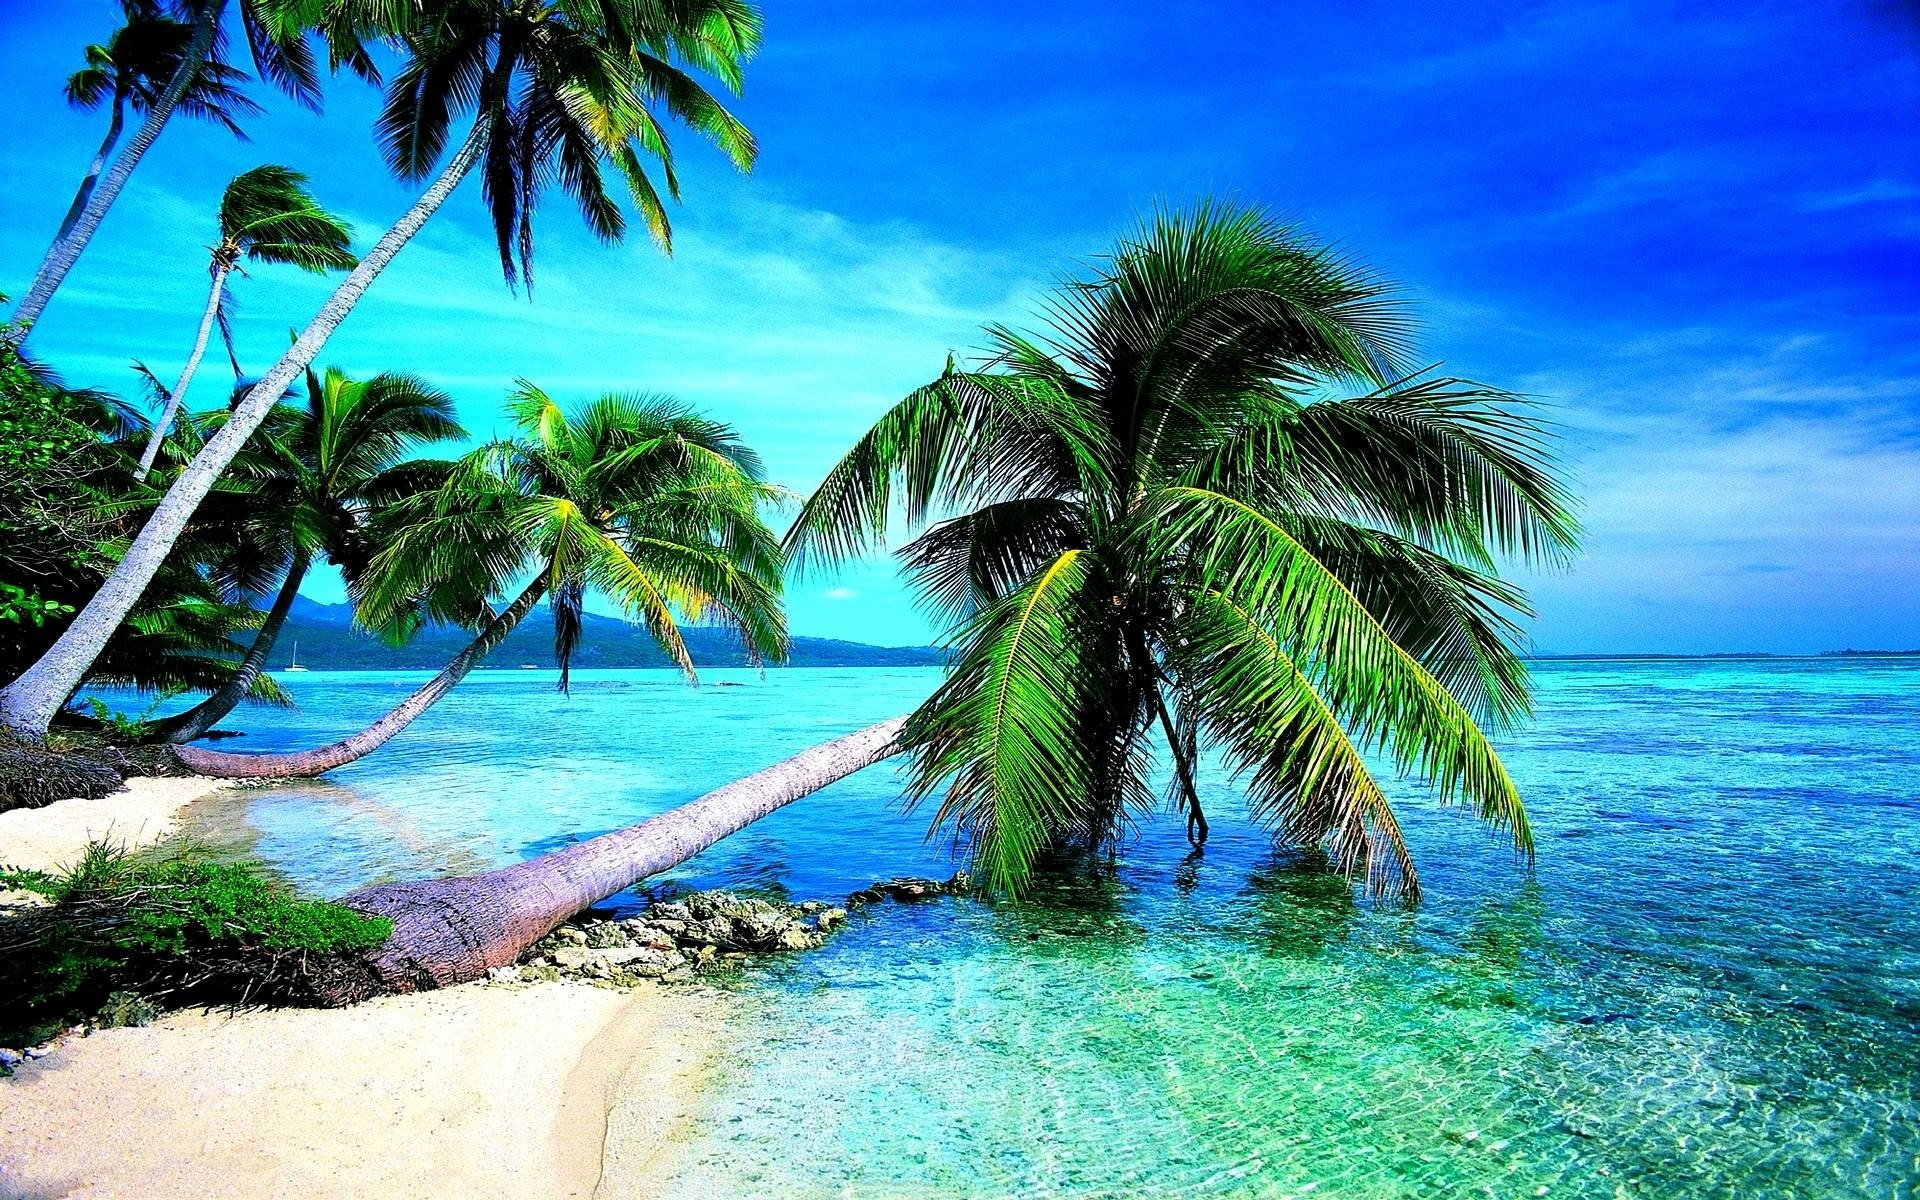 tropical beach hd wallpaper (68+ images)